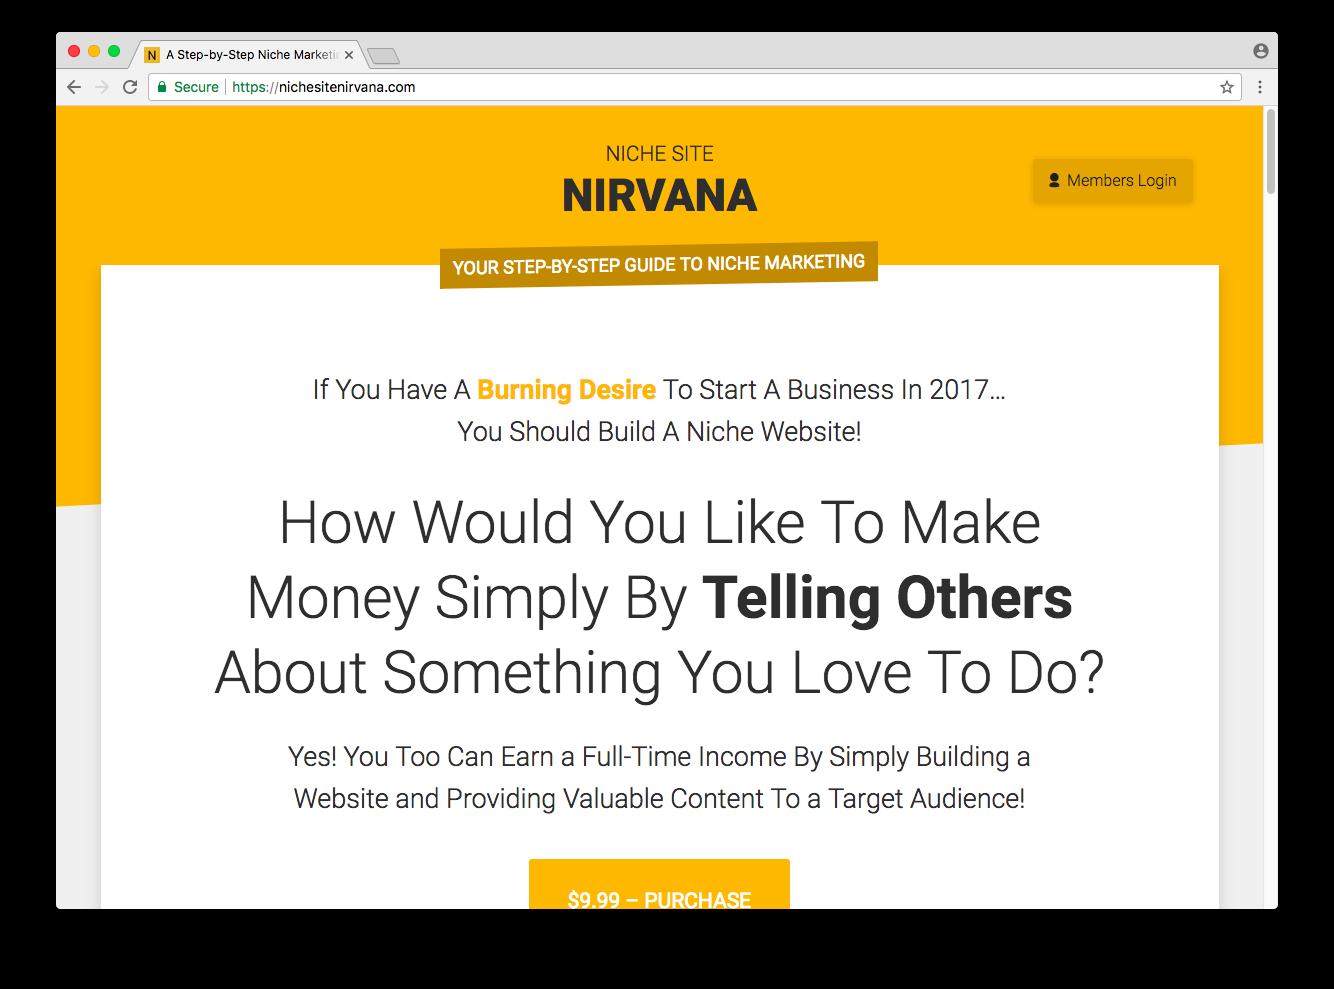 Niche Site Nirvana